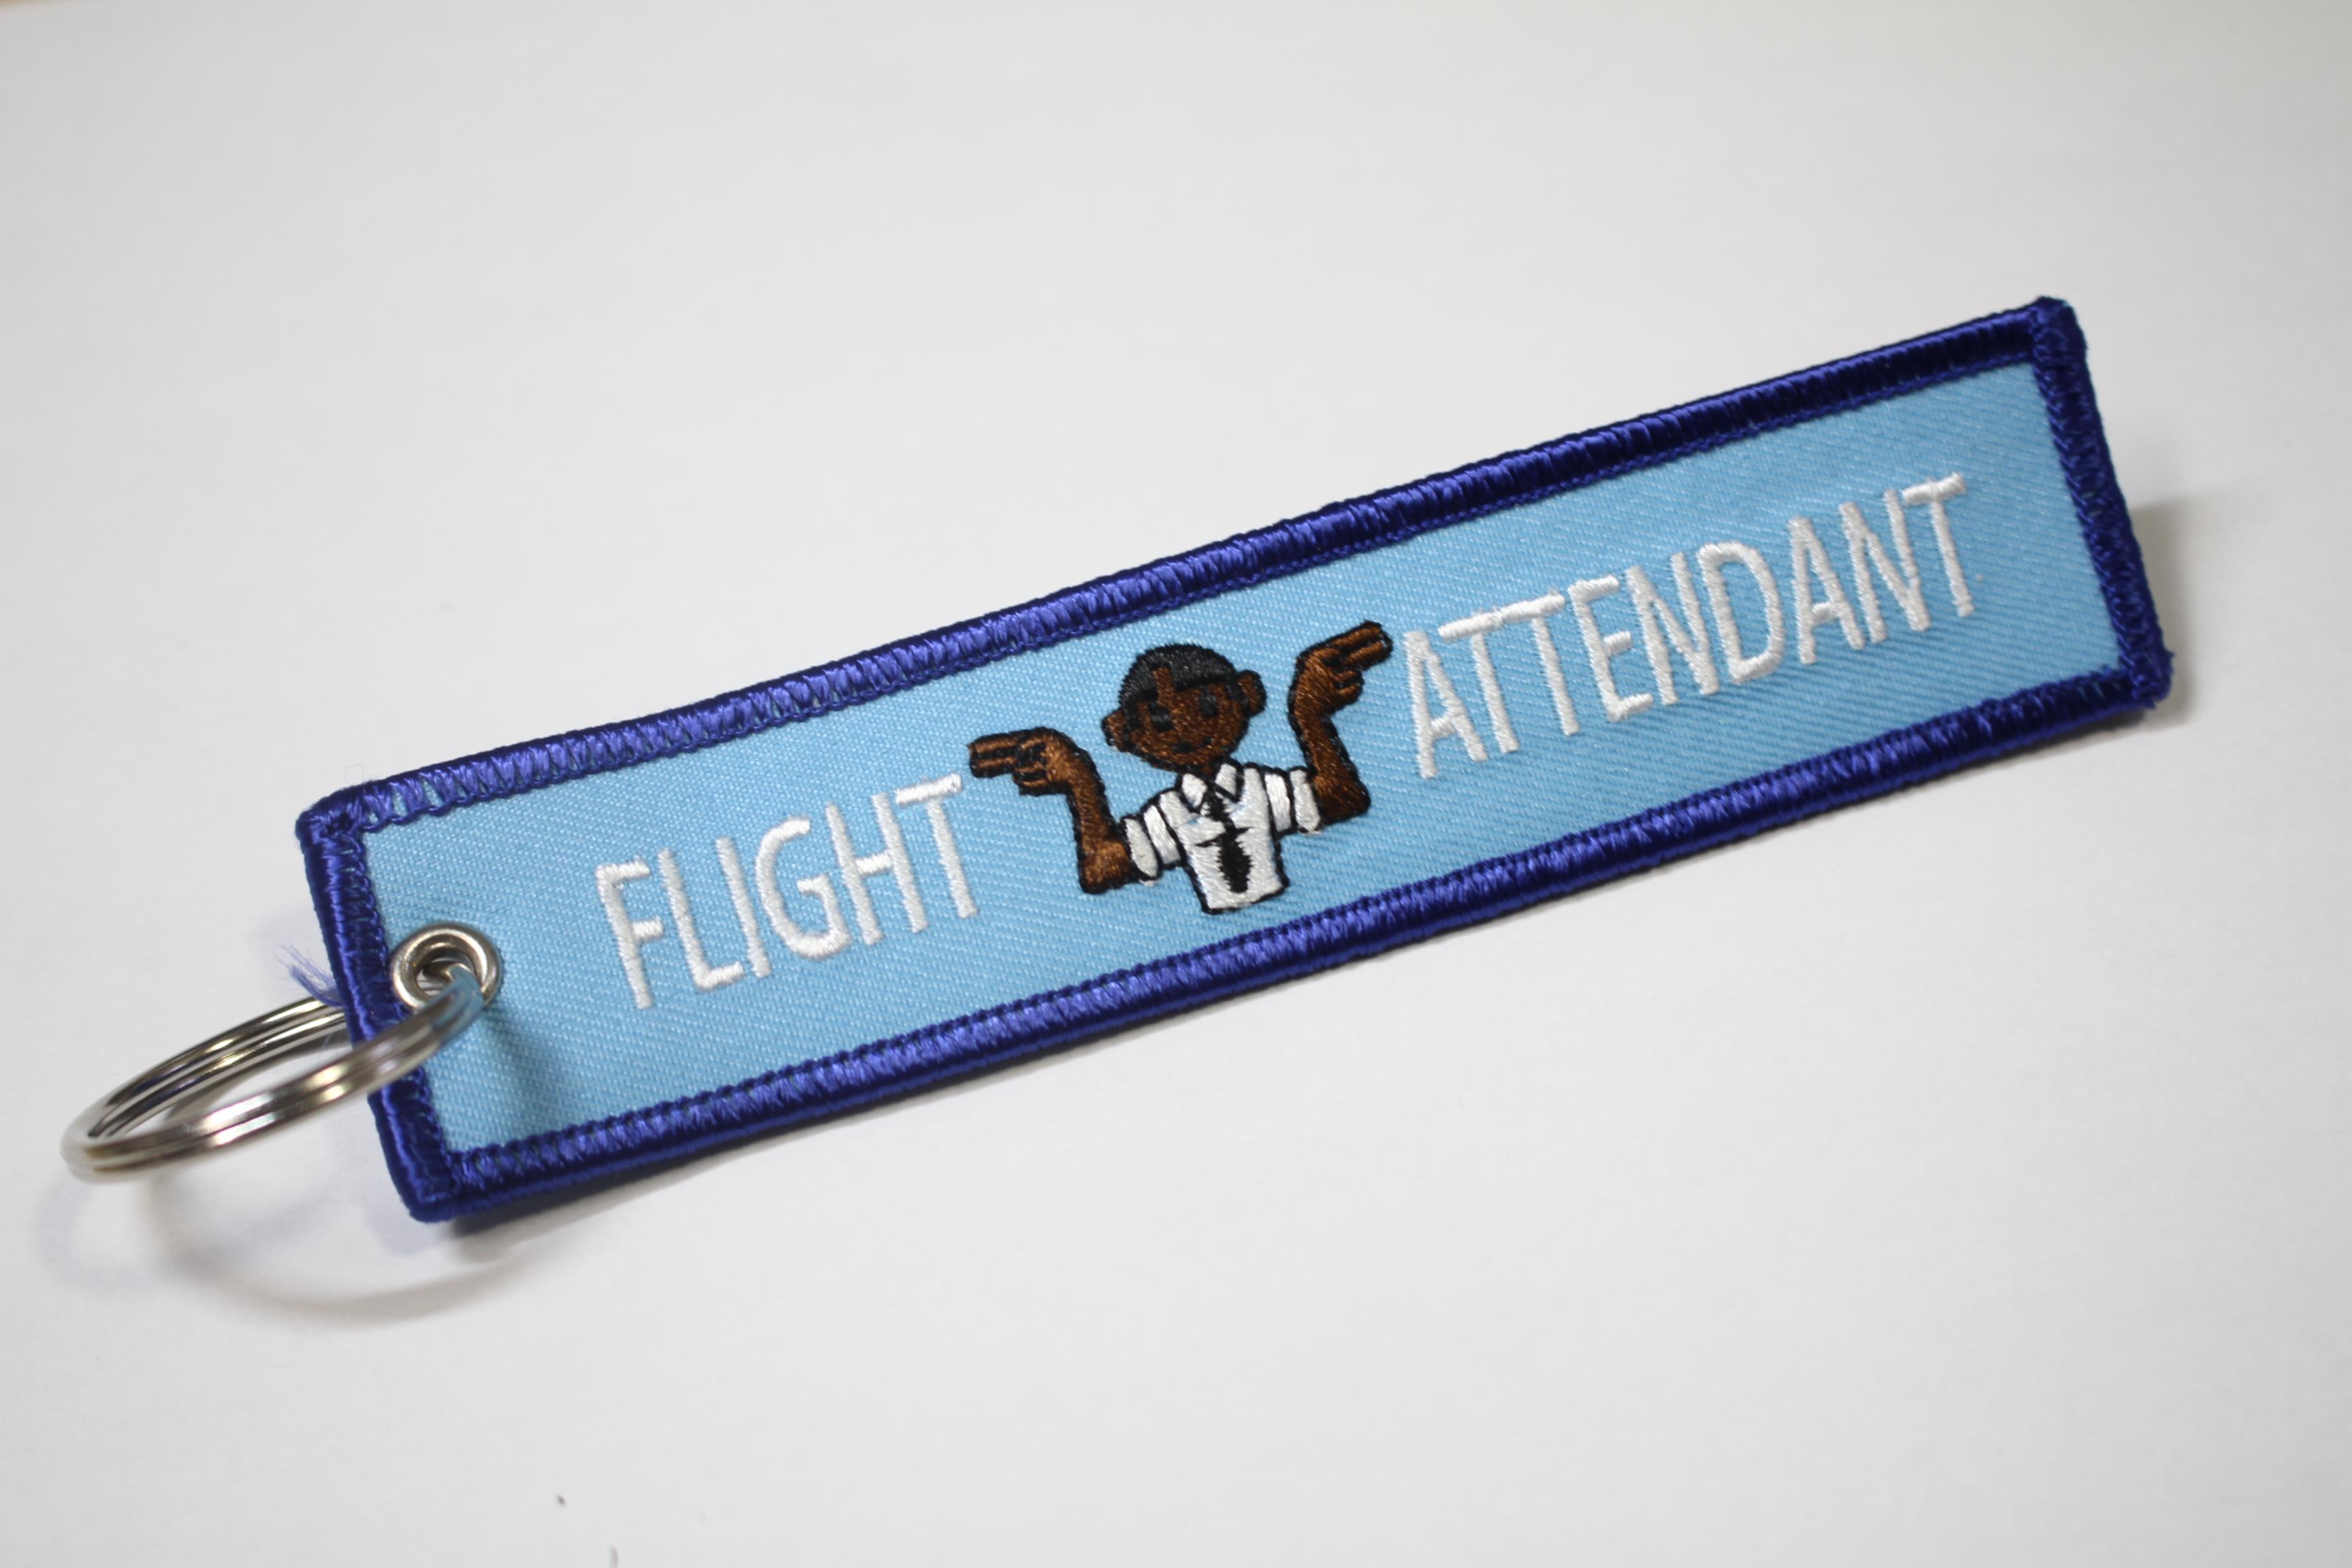 REMOVE BEFORE FLIGHTキーホルダー FLIGHT ATTENDANT